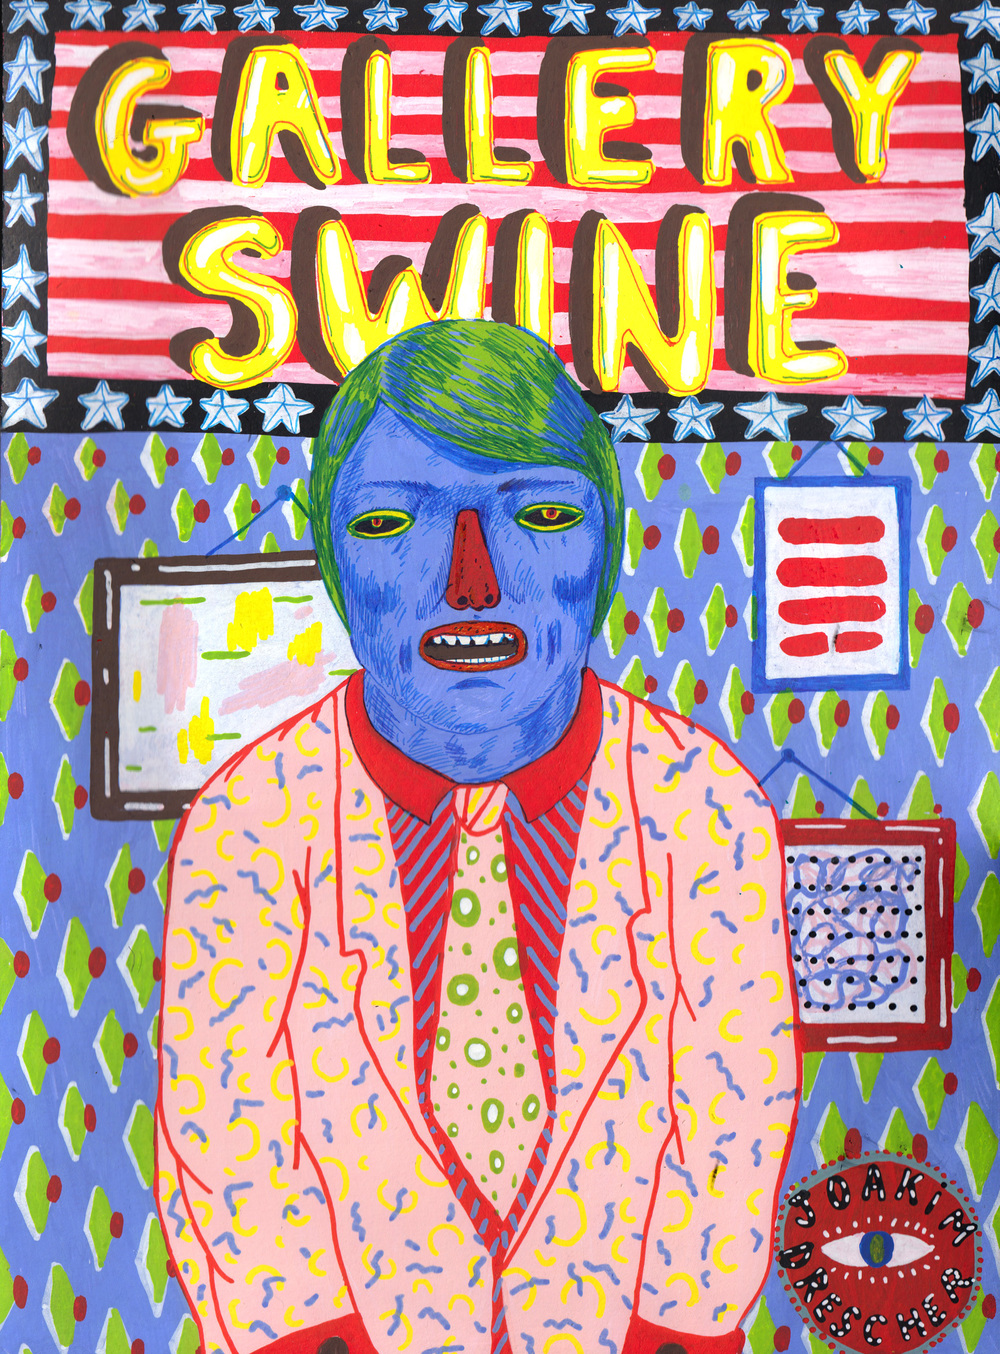 Gallery Swine , 2015 @Joakim Drescher